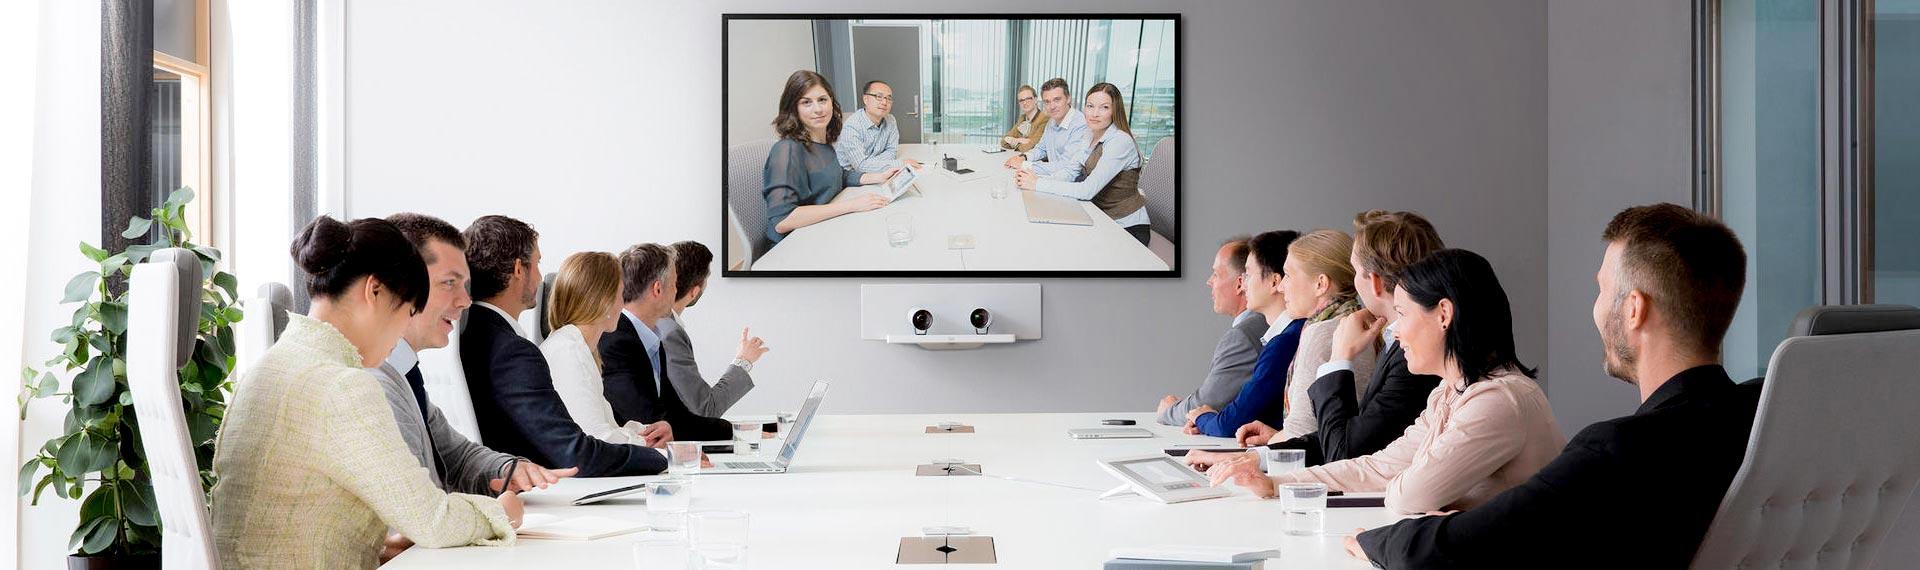 sistemi di videoconferenza meeting videochiamata novara